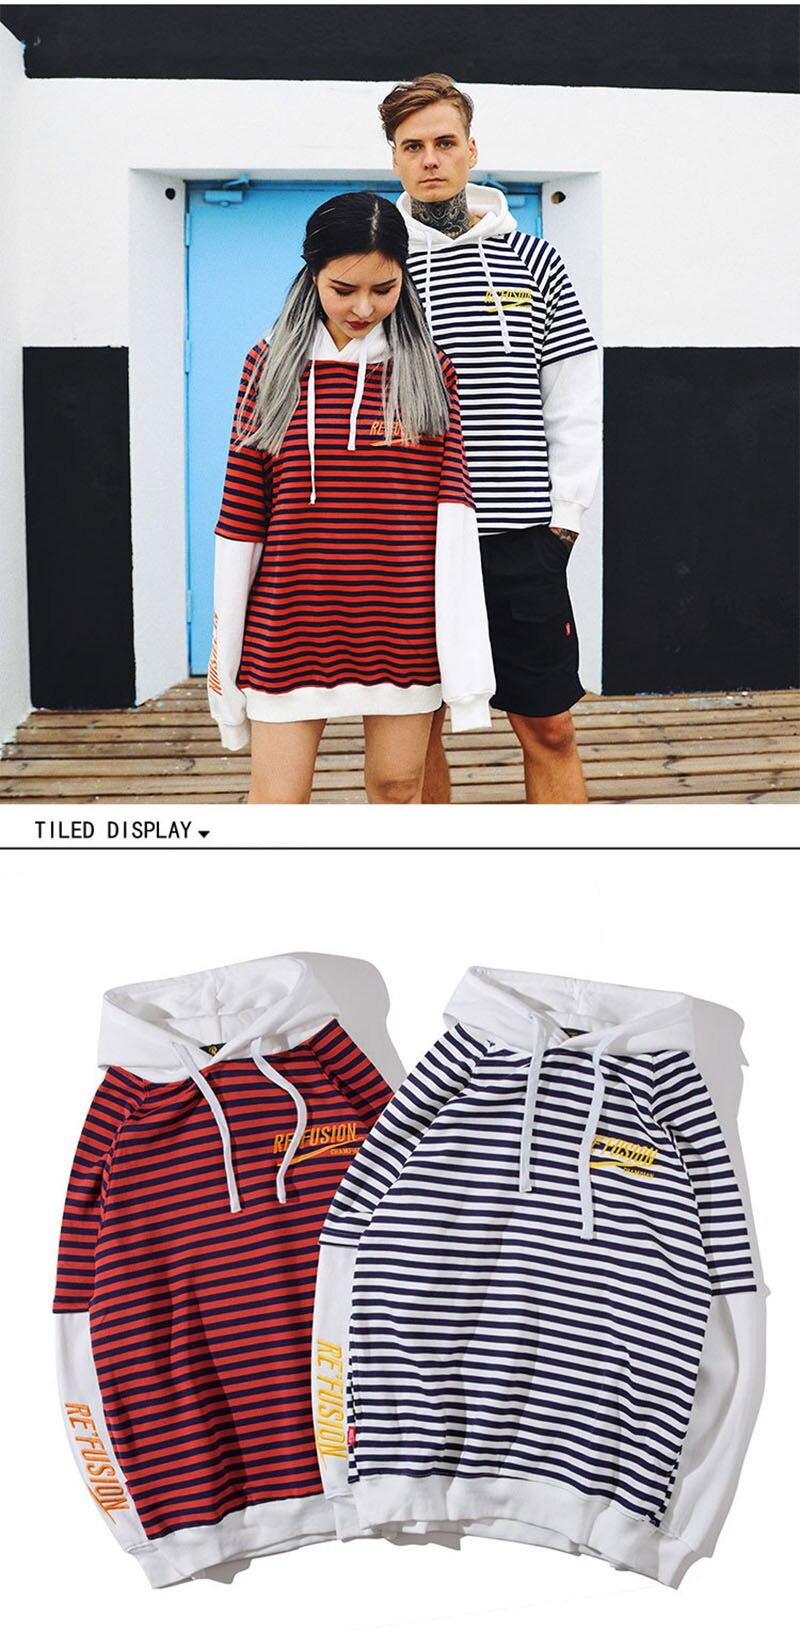 Aolamegs Male Sweatshirt Striped Hooded Sweatshirts O-Neck Pullover Loose Streetwear High Street Hip hop Fashion Winter Couple (14)